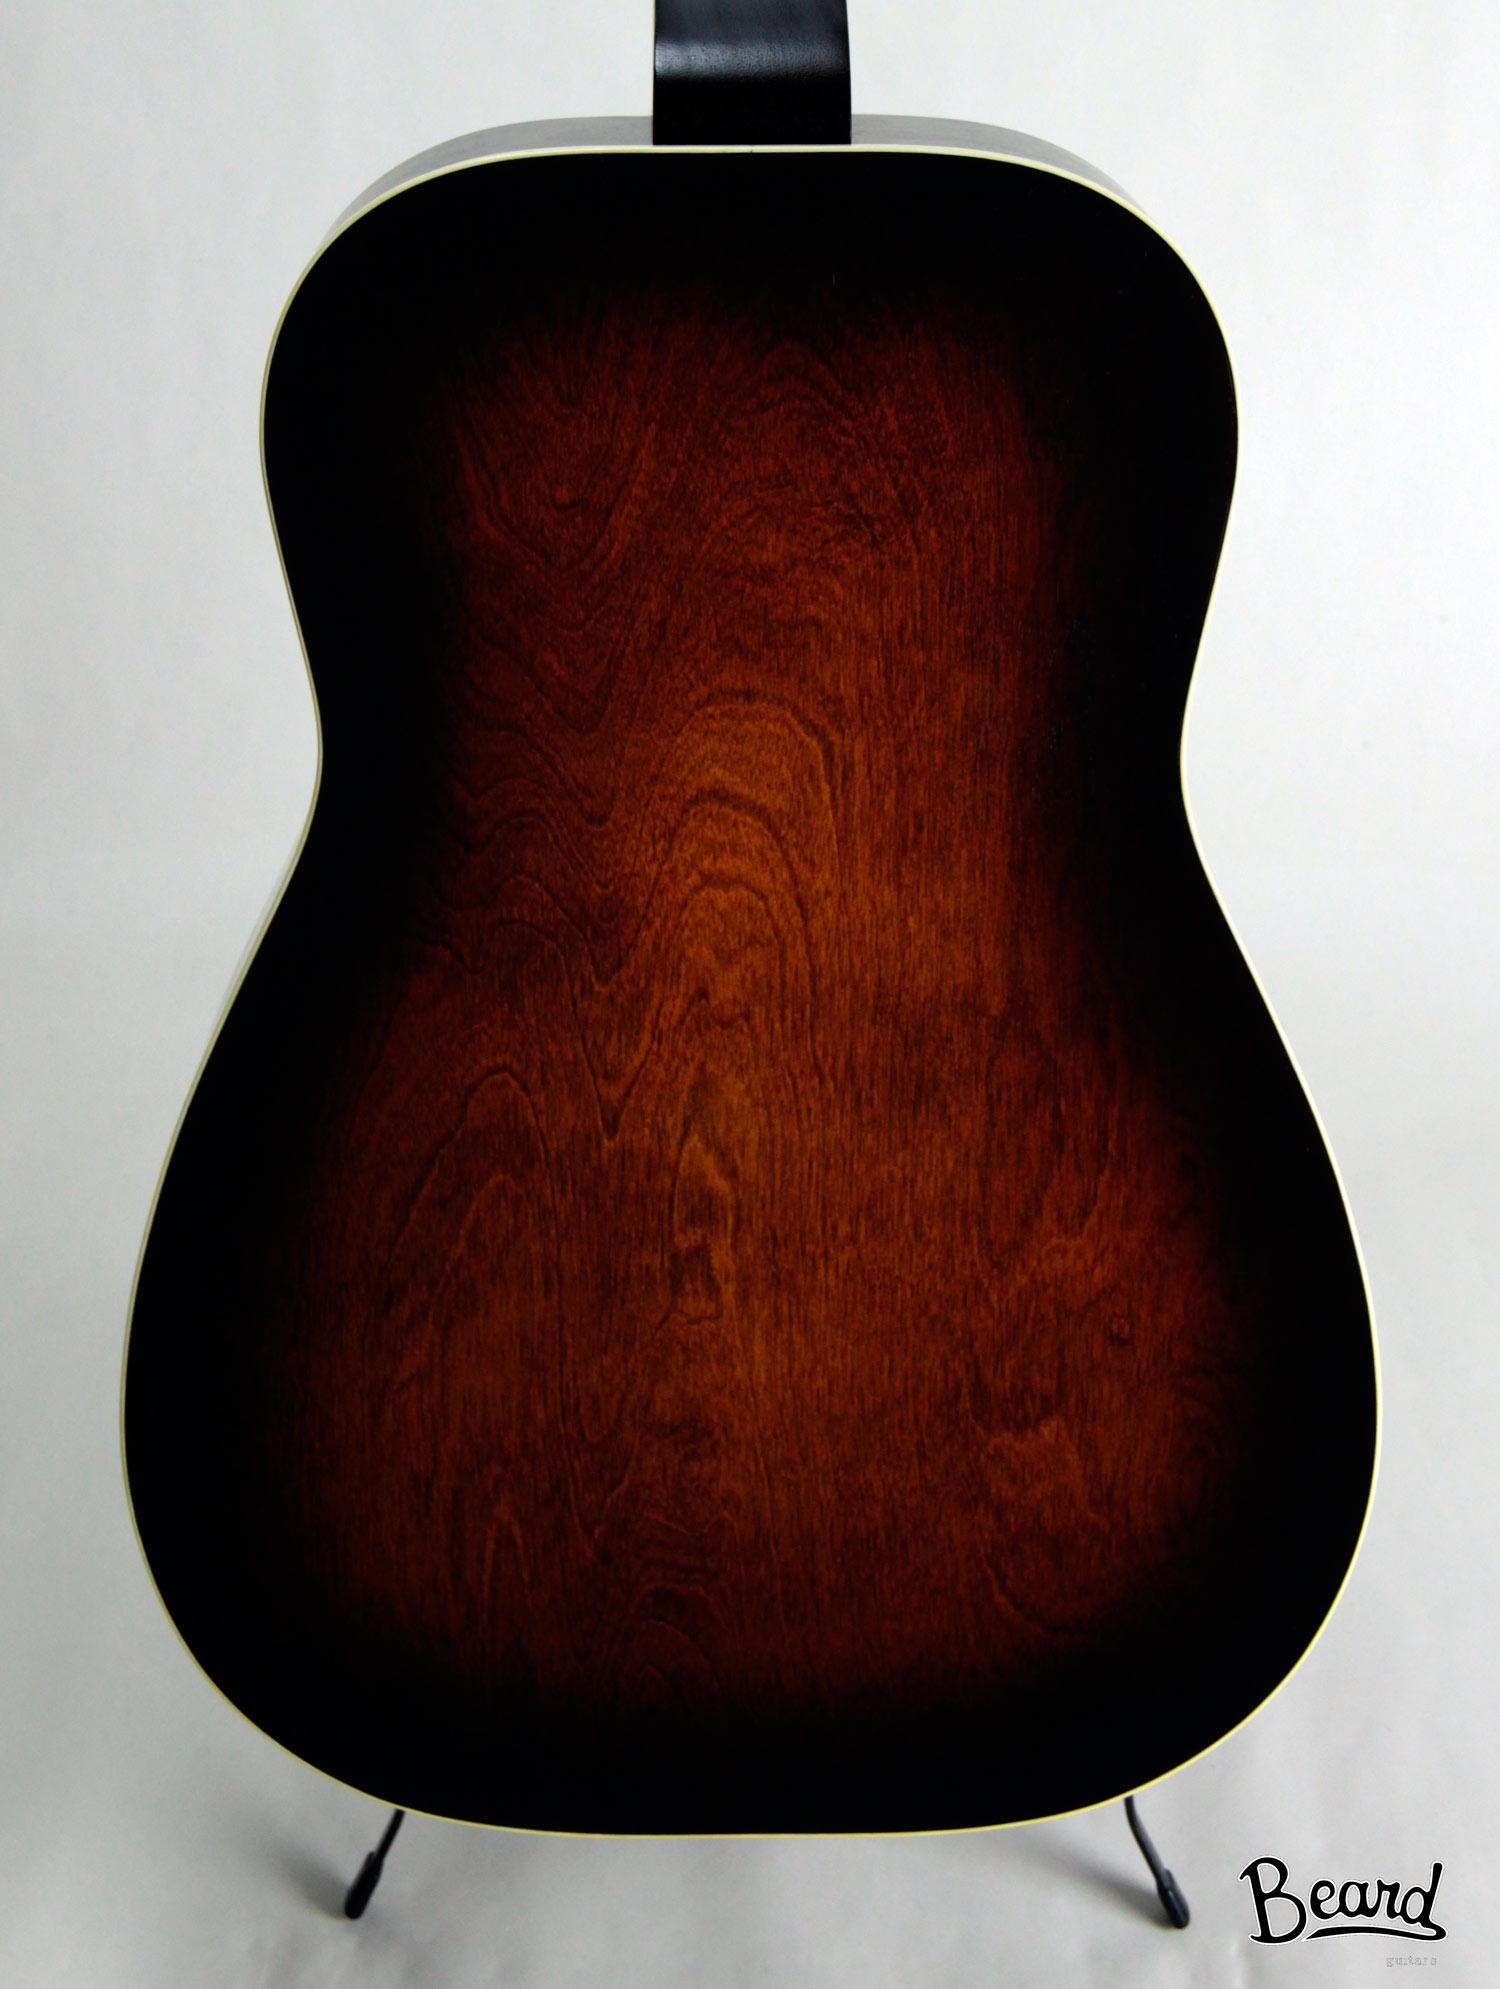 Beard Deco Phonic™ Model 57